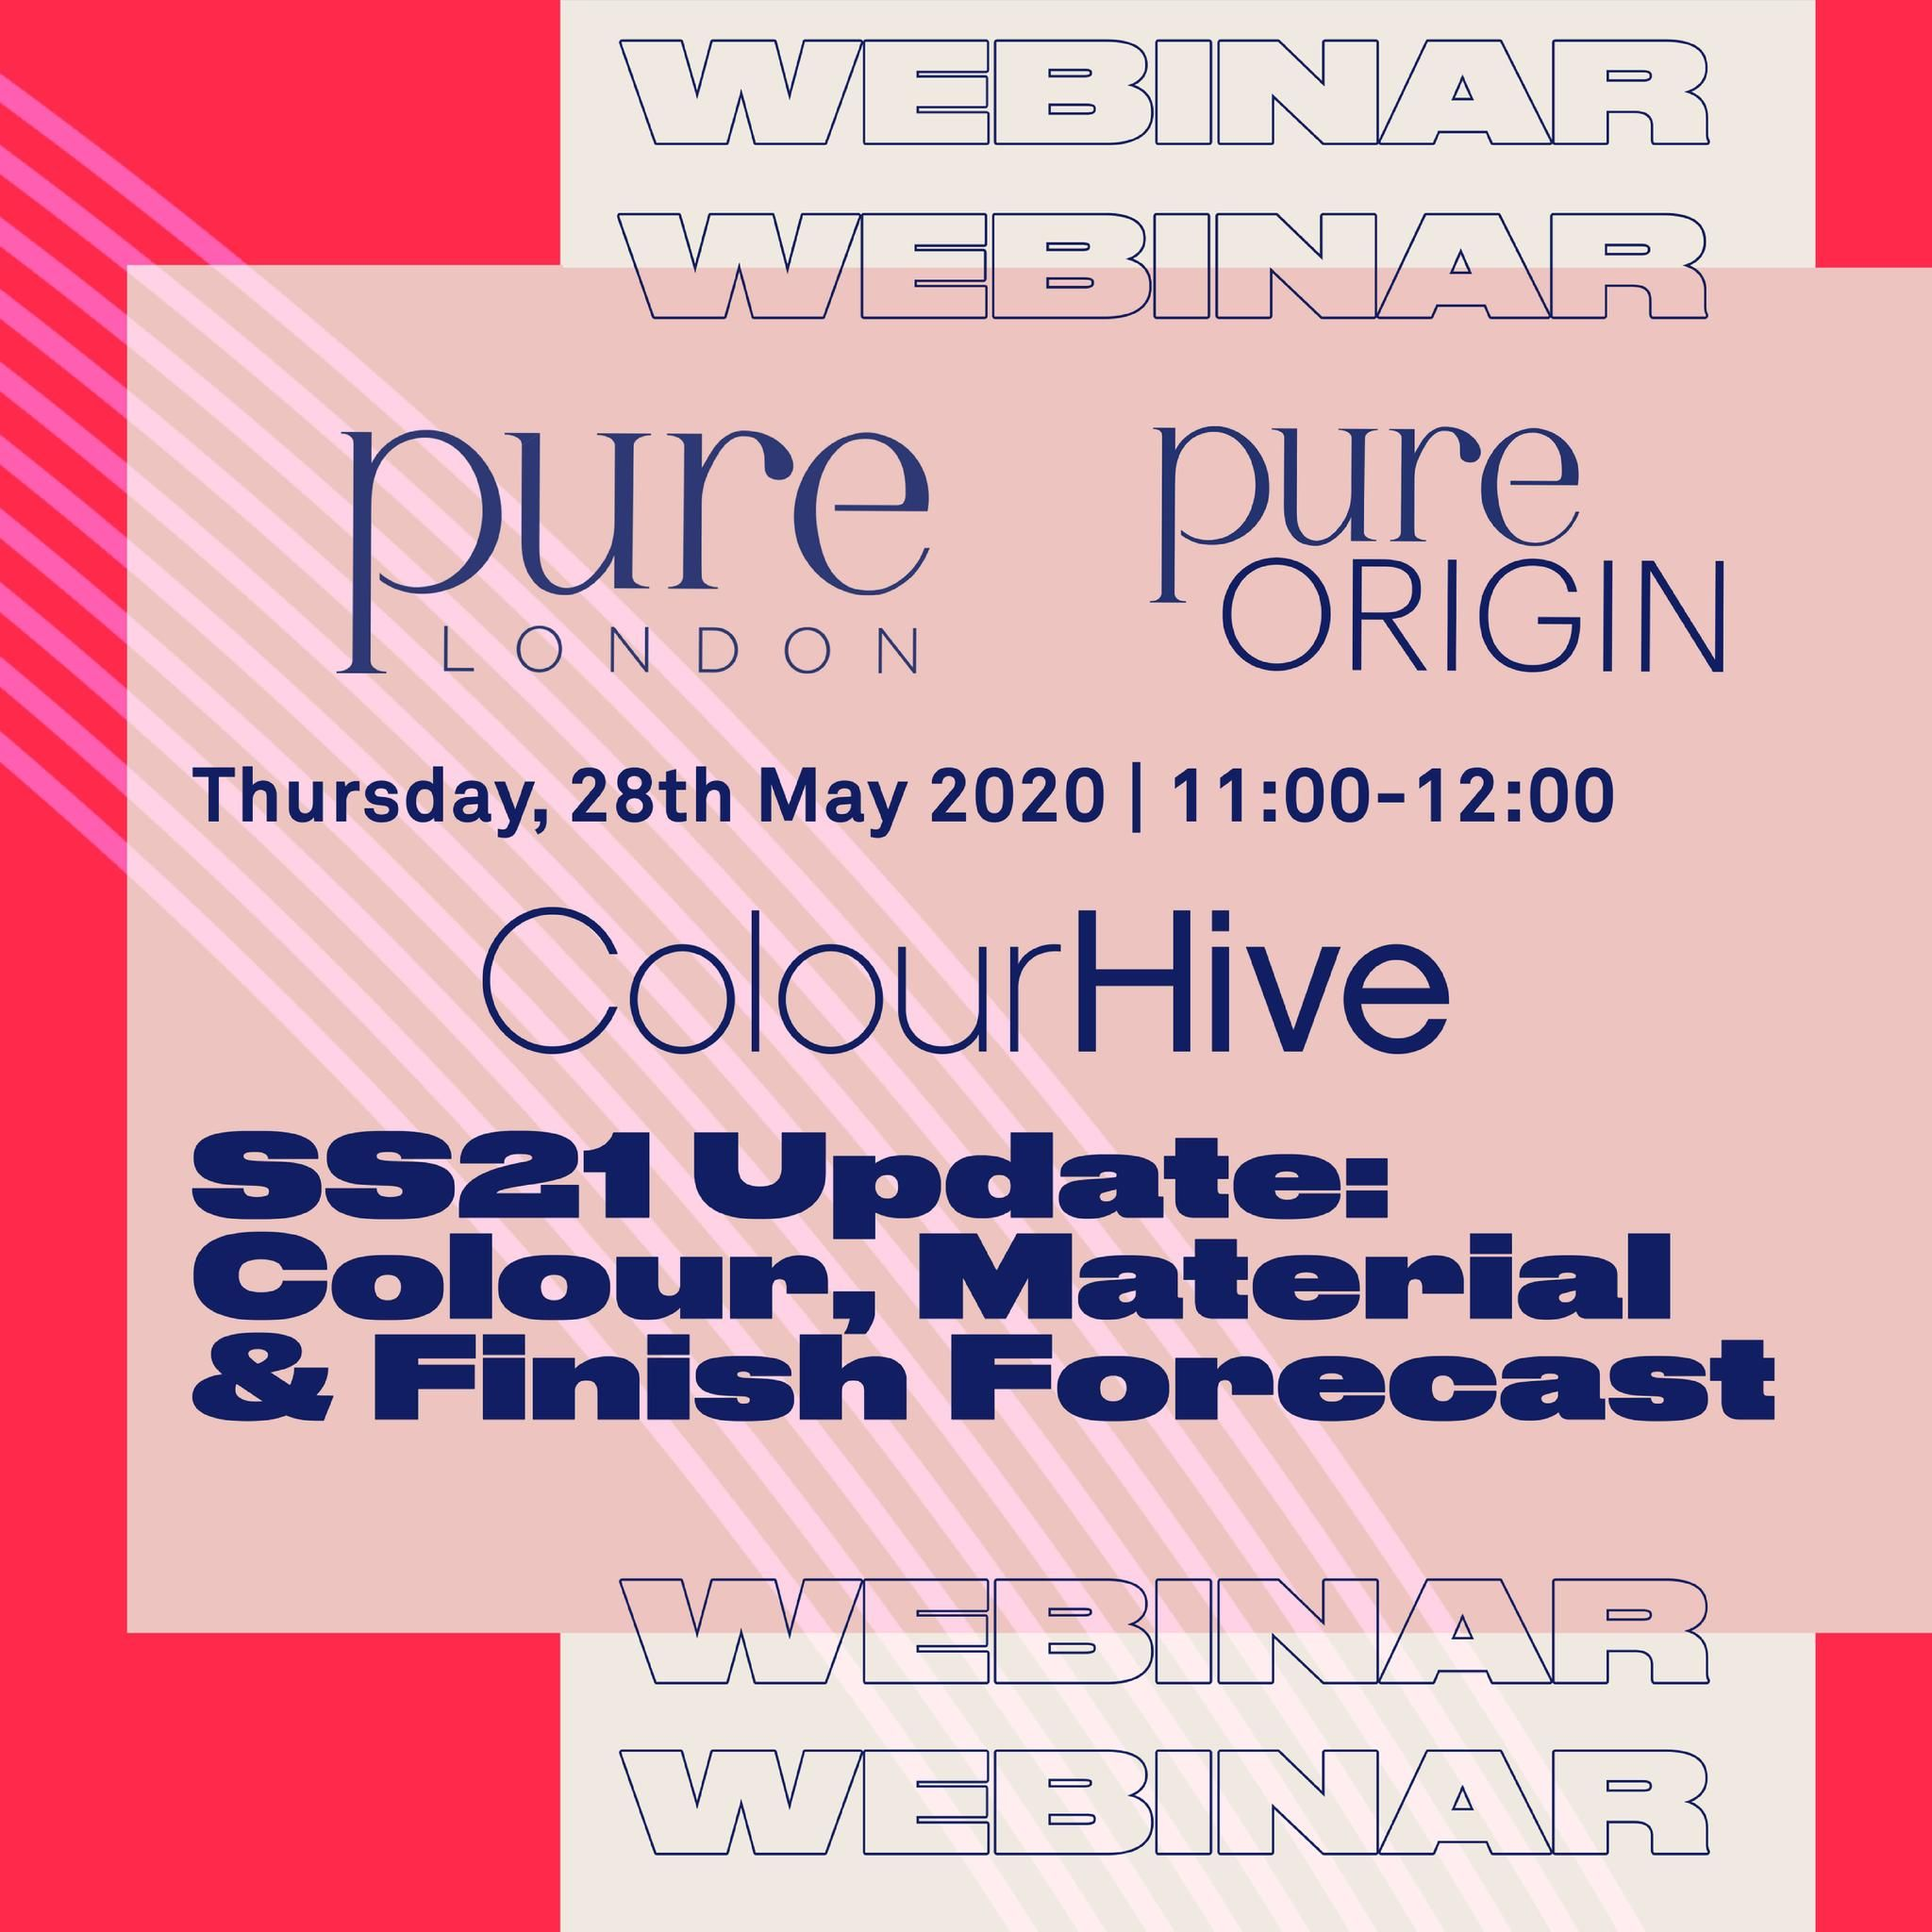 Webinar_Card_Pure_London_28th_May_ColourHive.jpg